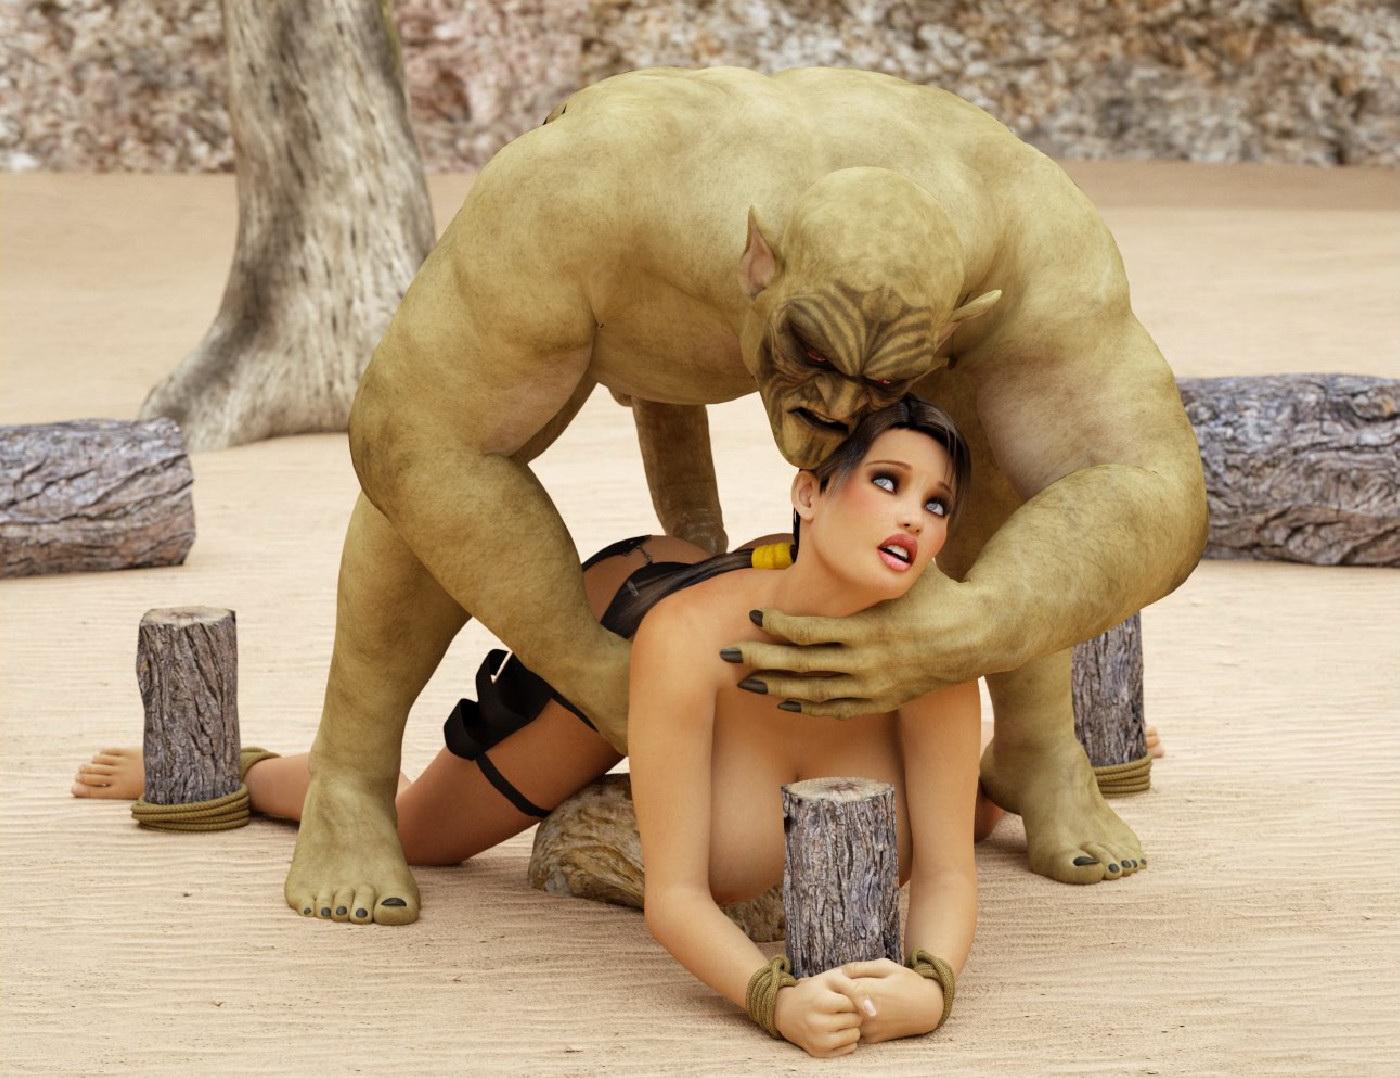 Fantasy Girl With Extra Large Tits Nailed Big Ogres